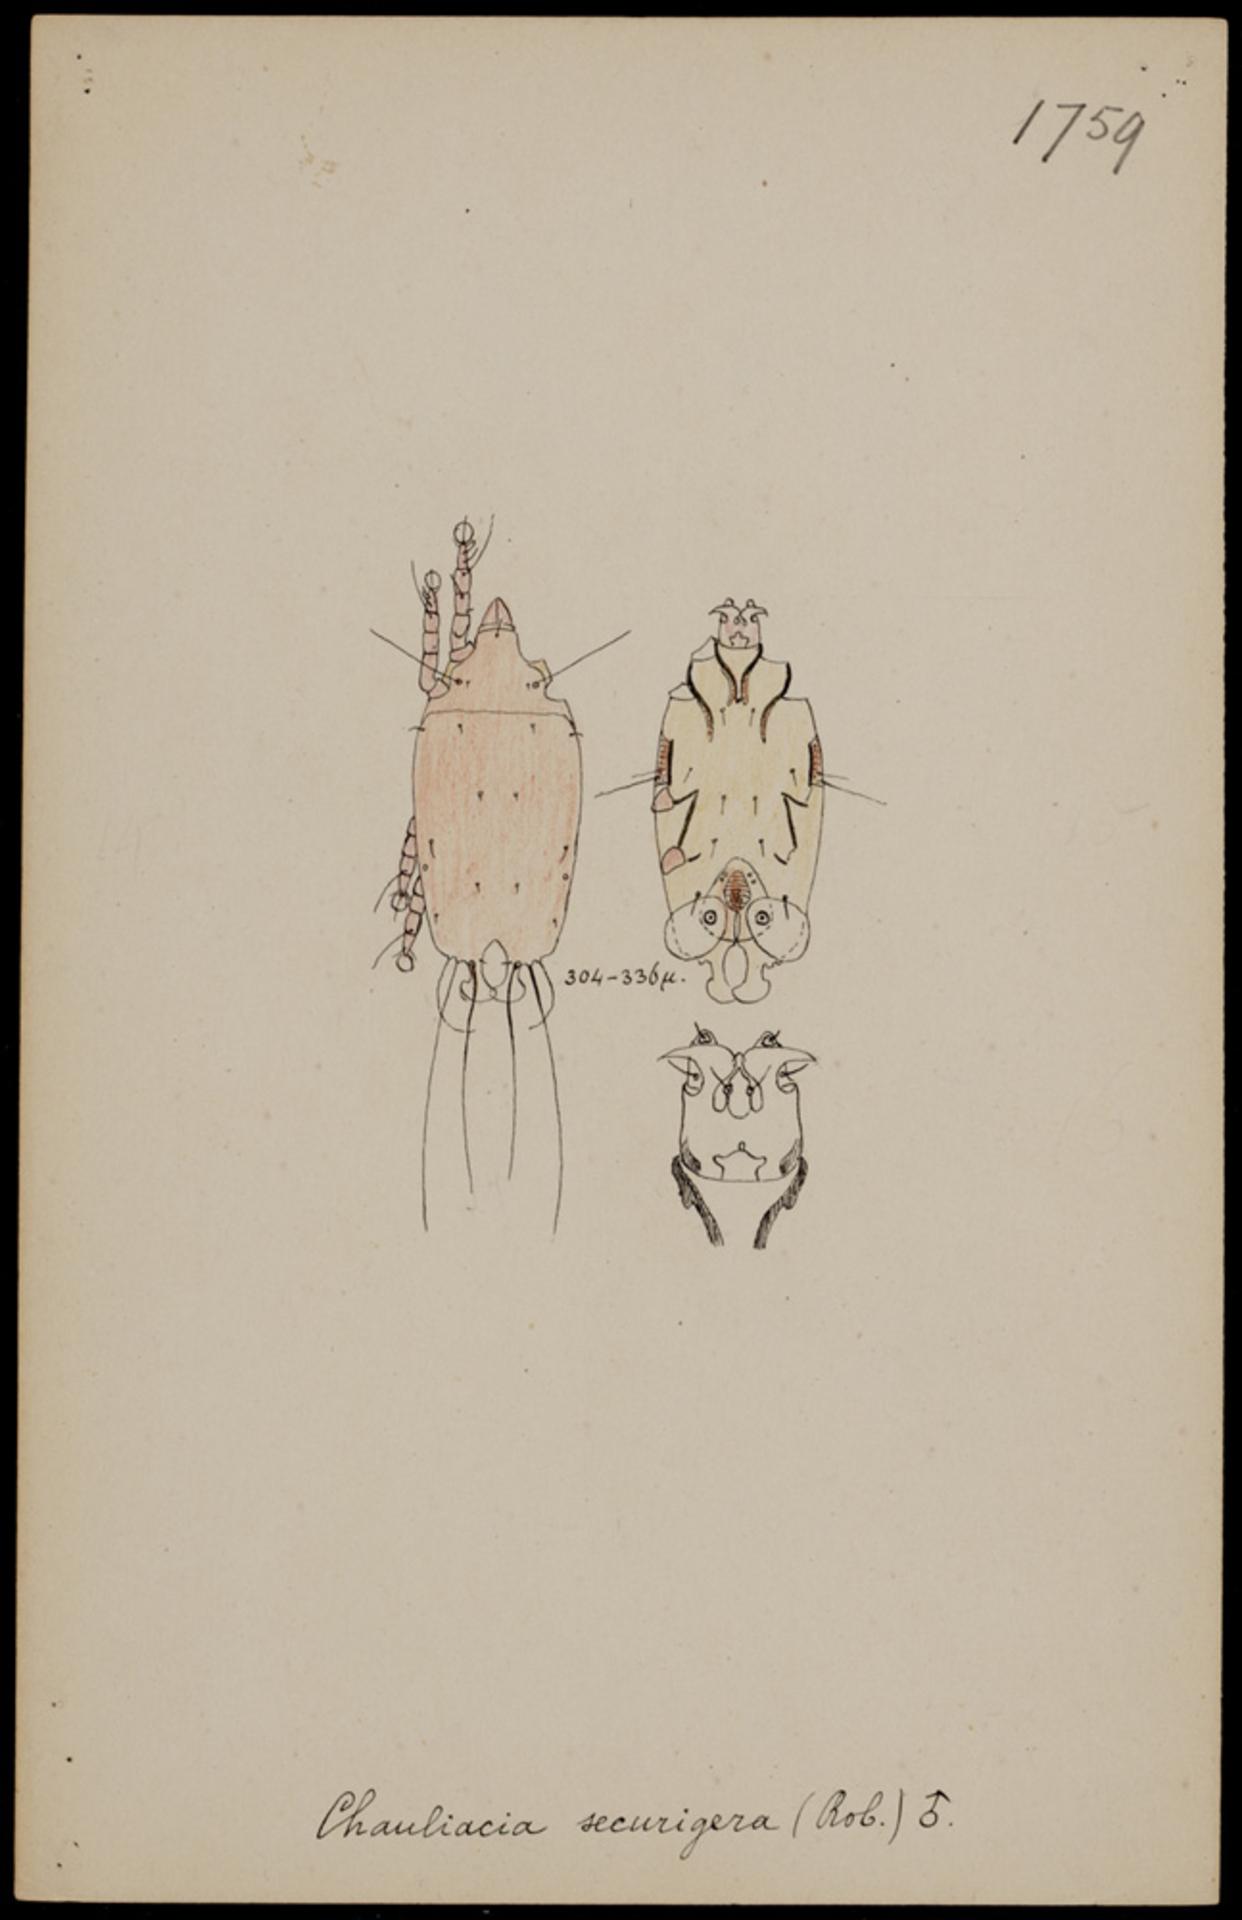 RMNH.ART.1974 | Chauliacia securigera (Rob.)